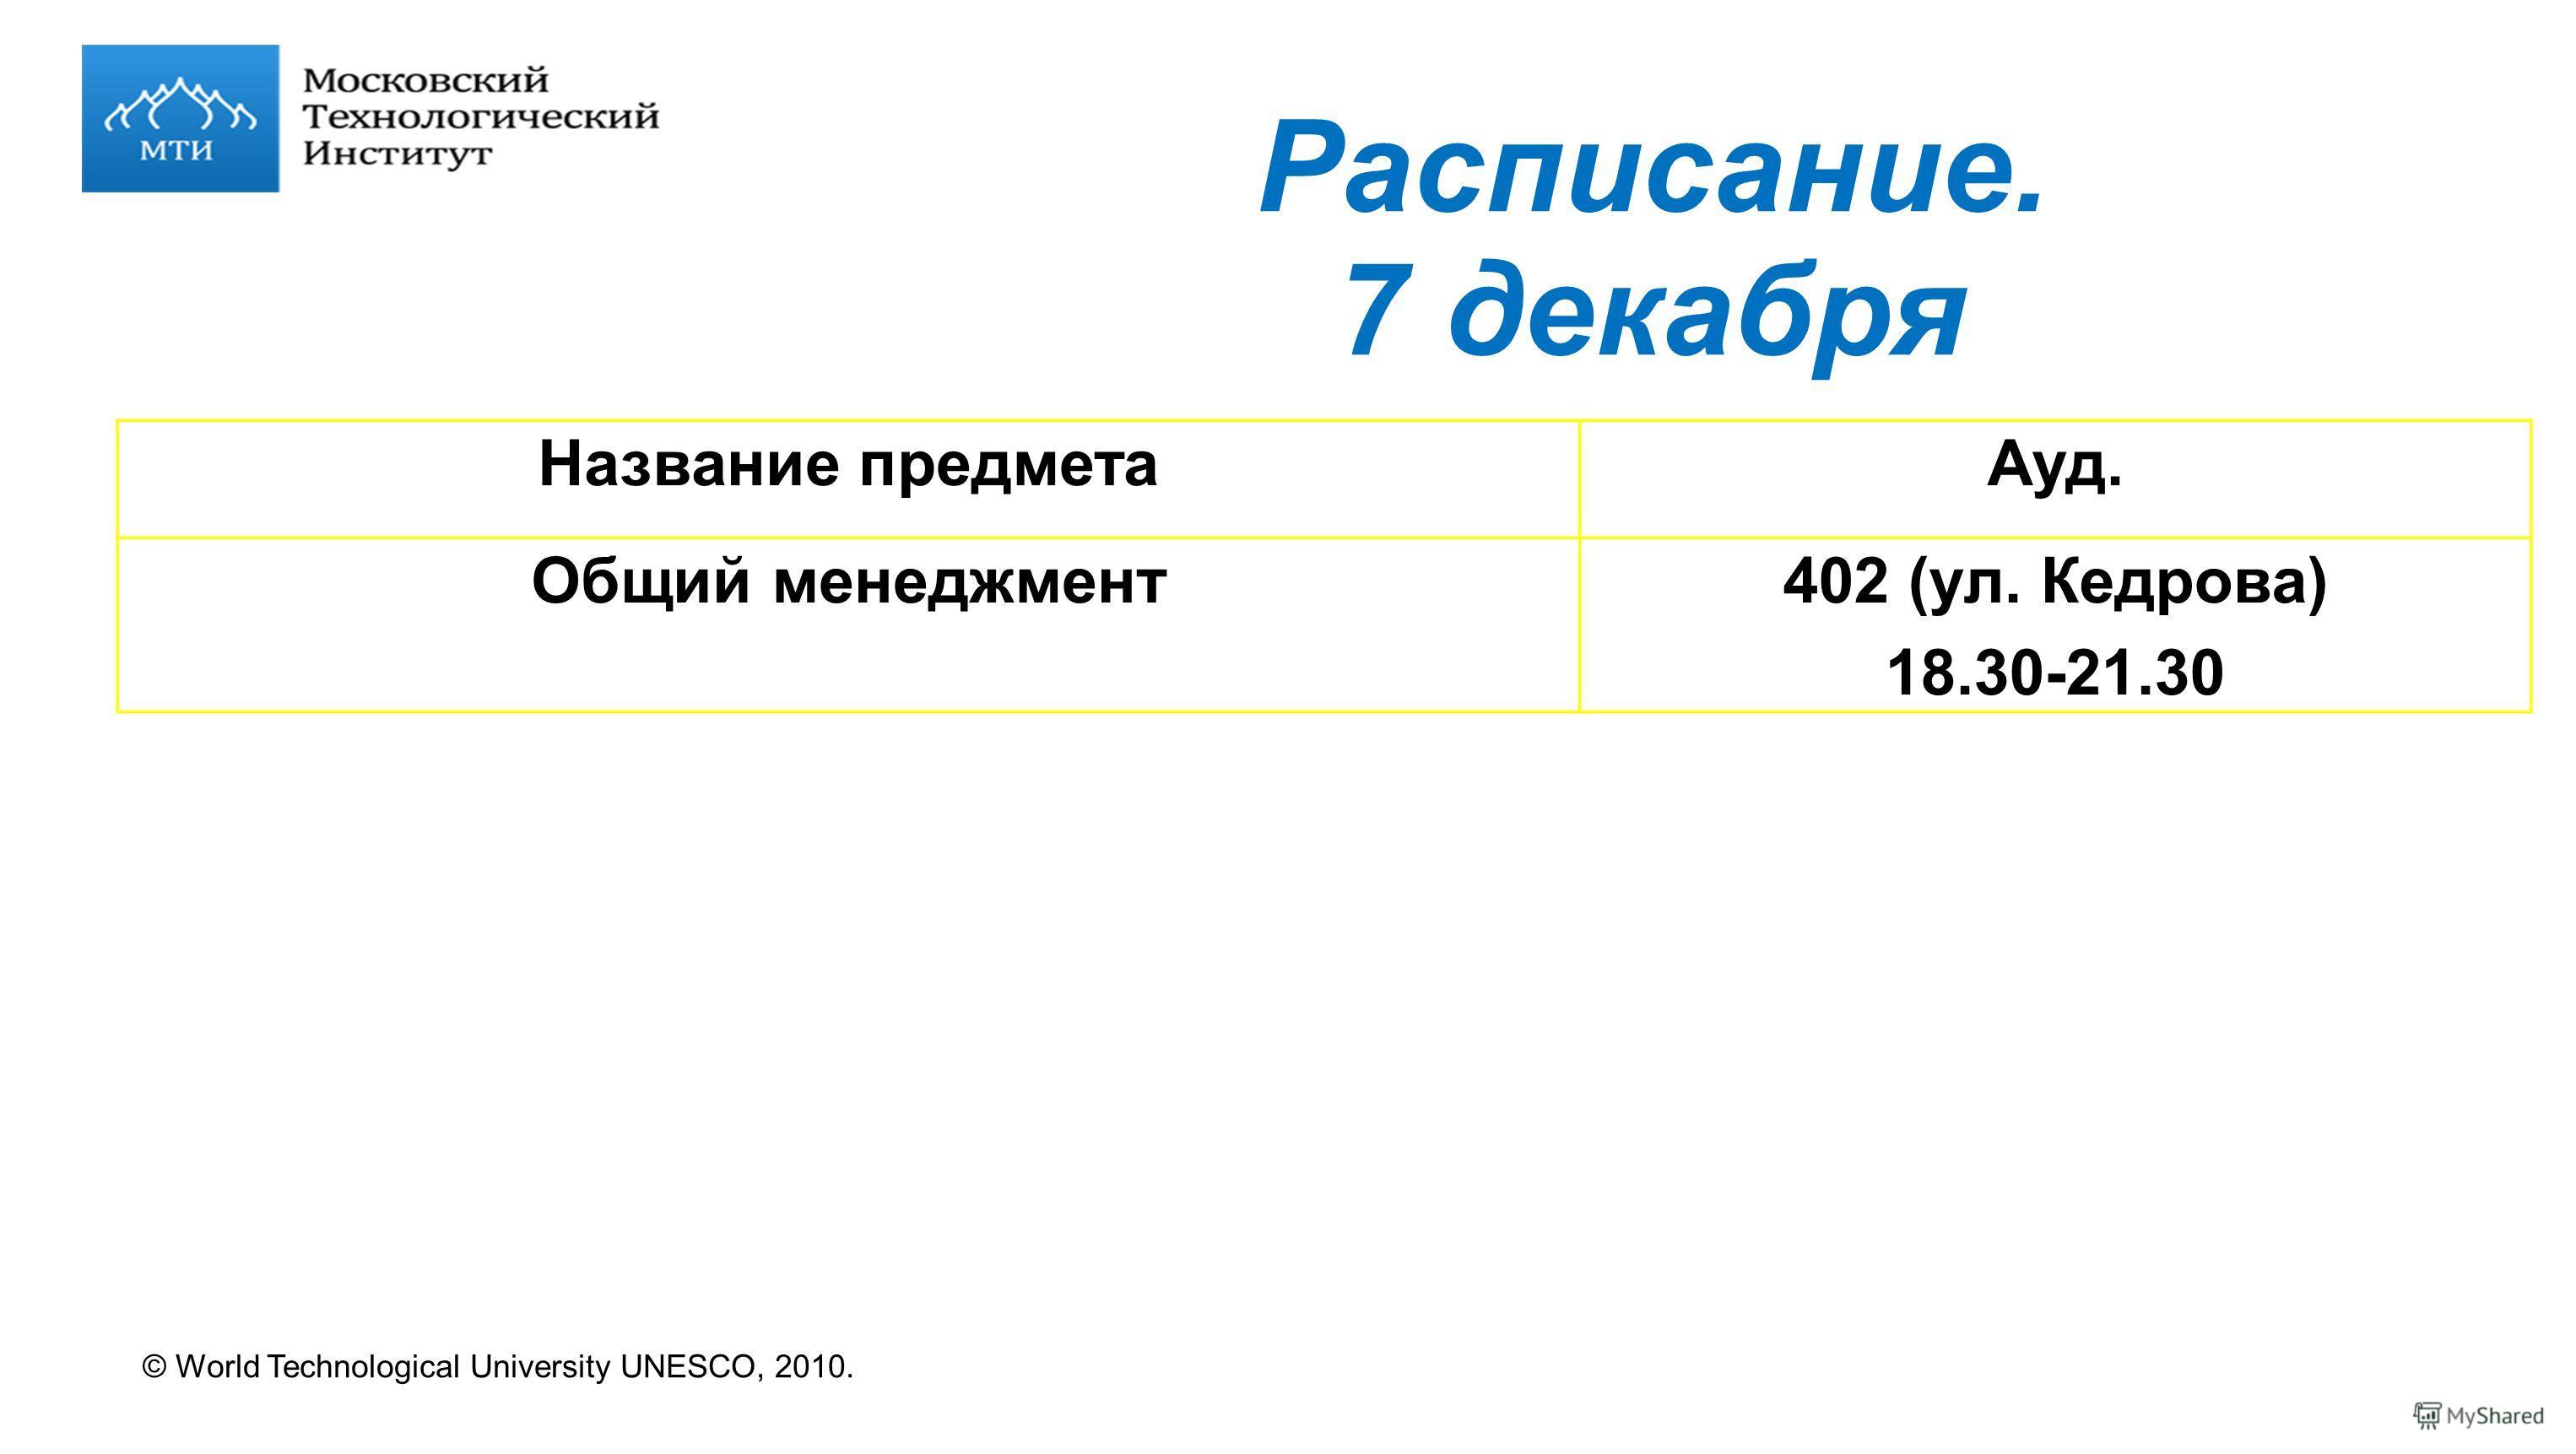 © World Technological University UNESCO, 2010. Расписание. 7 декабря Название предметаАуд. Общий менеджмент402 (ул. Кедрова) 18.30-21.30